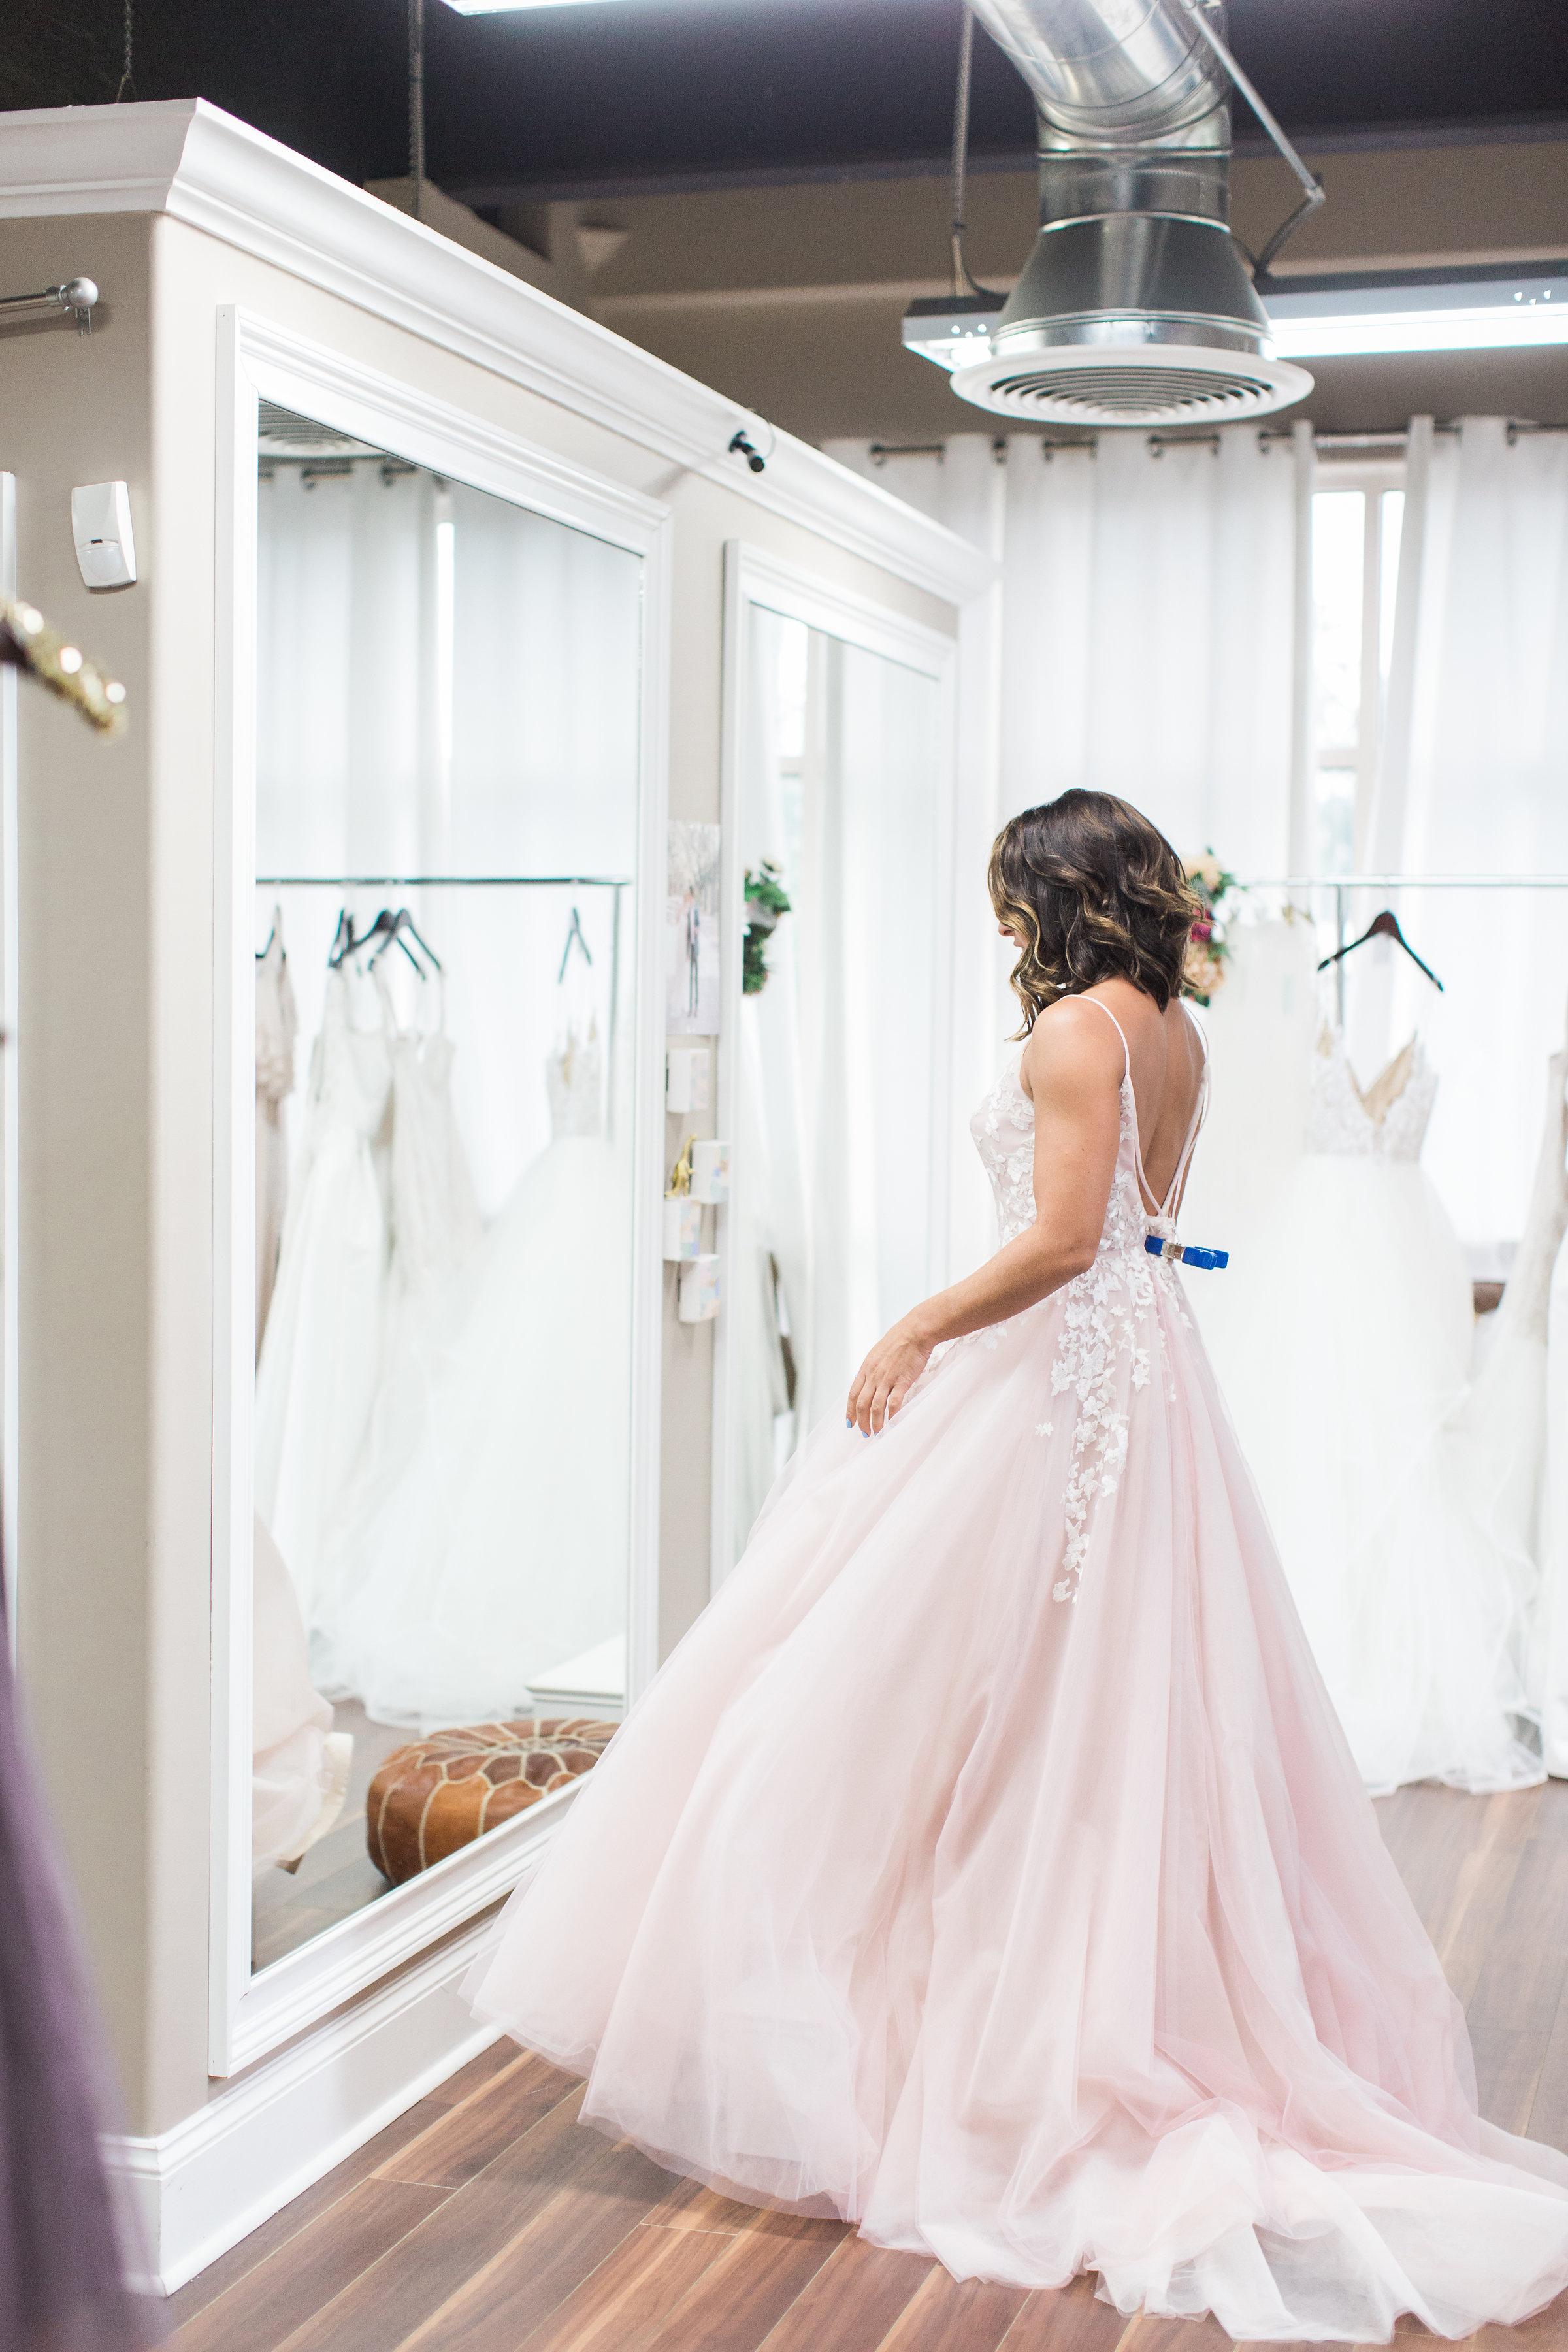 savannah-bridal-boutique-ivory-and-beau-savannah-bride-savannah-bridal-shop-wedding-dress-savannah-weddings-wedding-dress-savannah-aptbphotography-aptbphoto-veils-tiaras-bridal-jewelery-bridesmaids-dresses-bridesmaids-gowns-savannah-bridesmaids.jpg-47.jpg